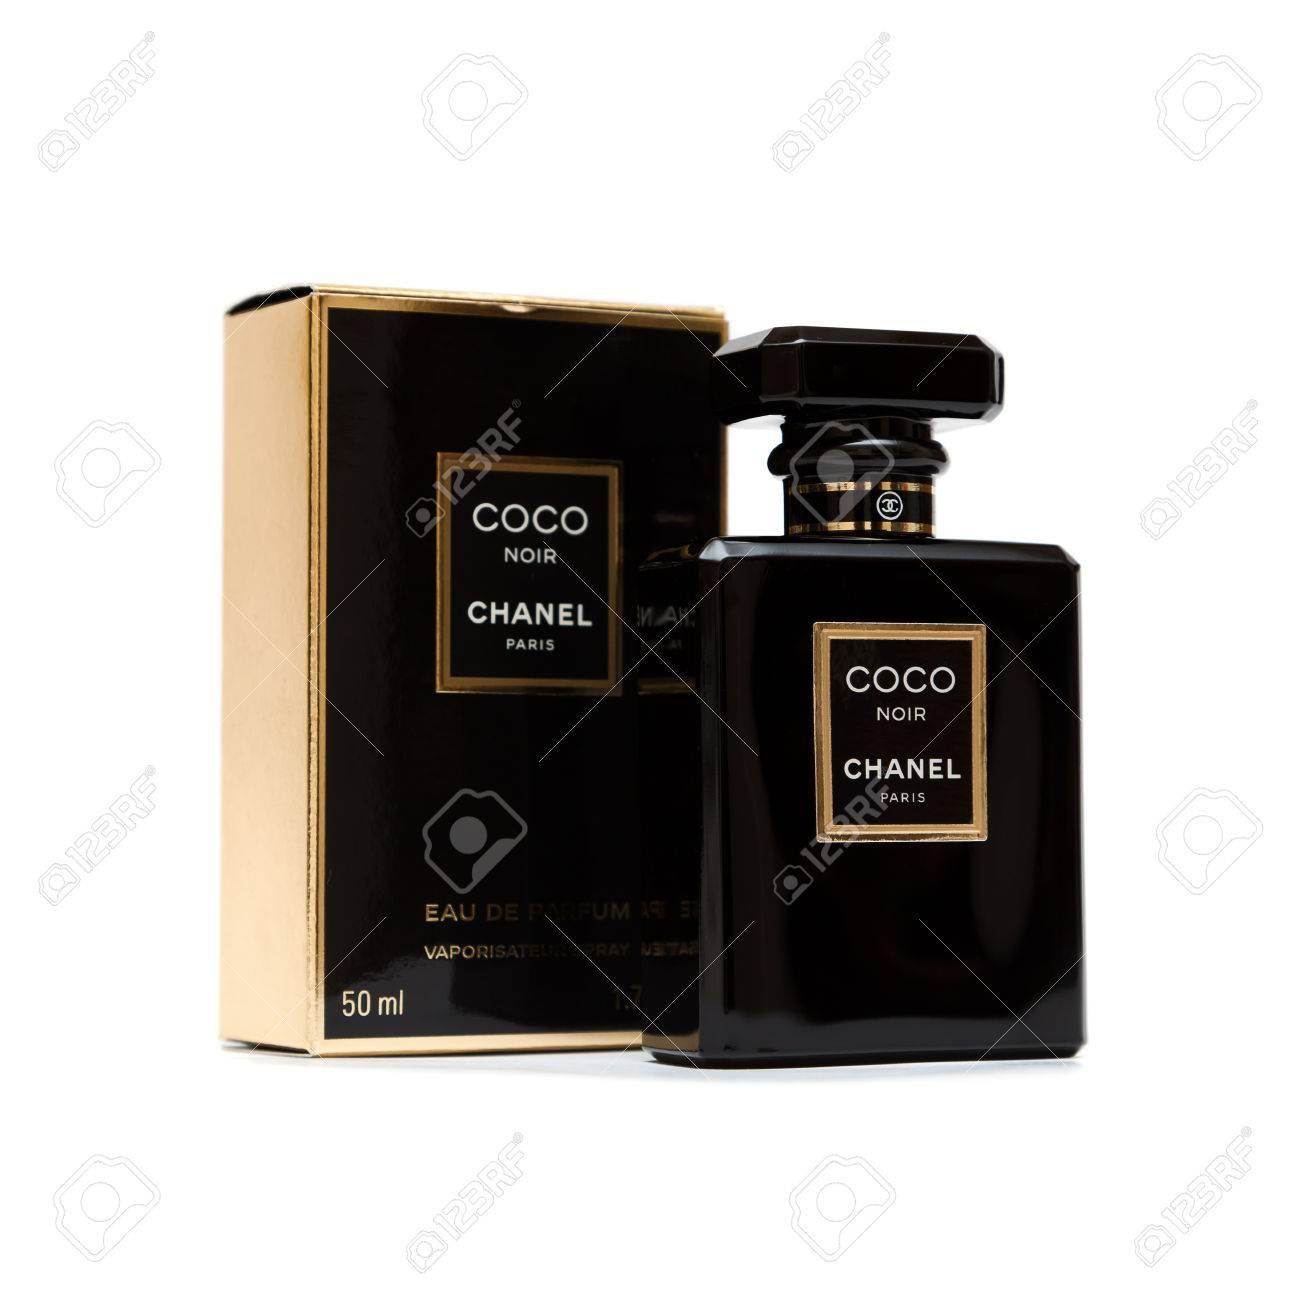 Russia October 11 2015 Coco Chanel Noir Black Perfume Bottle